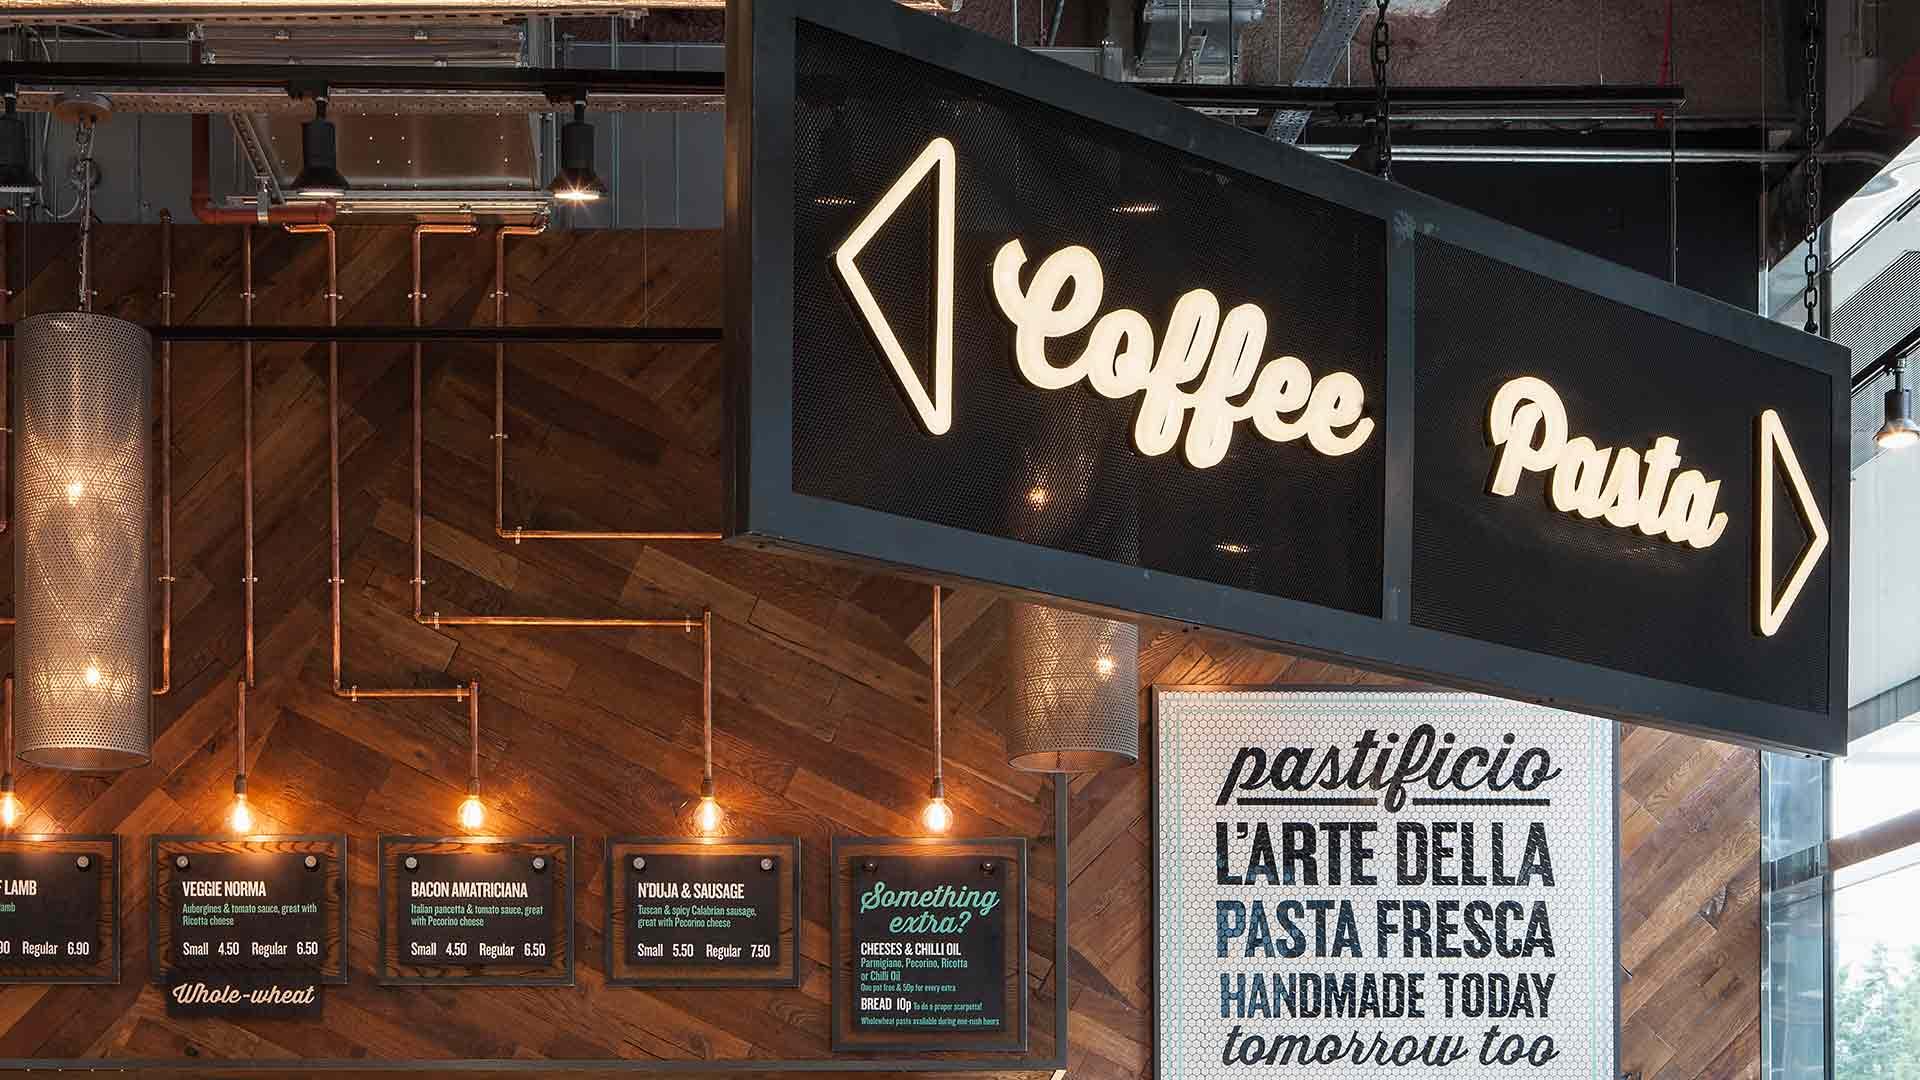 Coffee Pasta Neon Signage Conduit Light Installation Menus Lighting Scheme Nulty